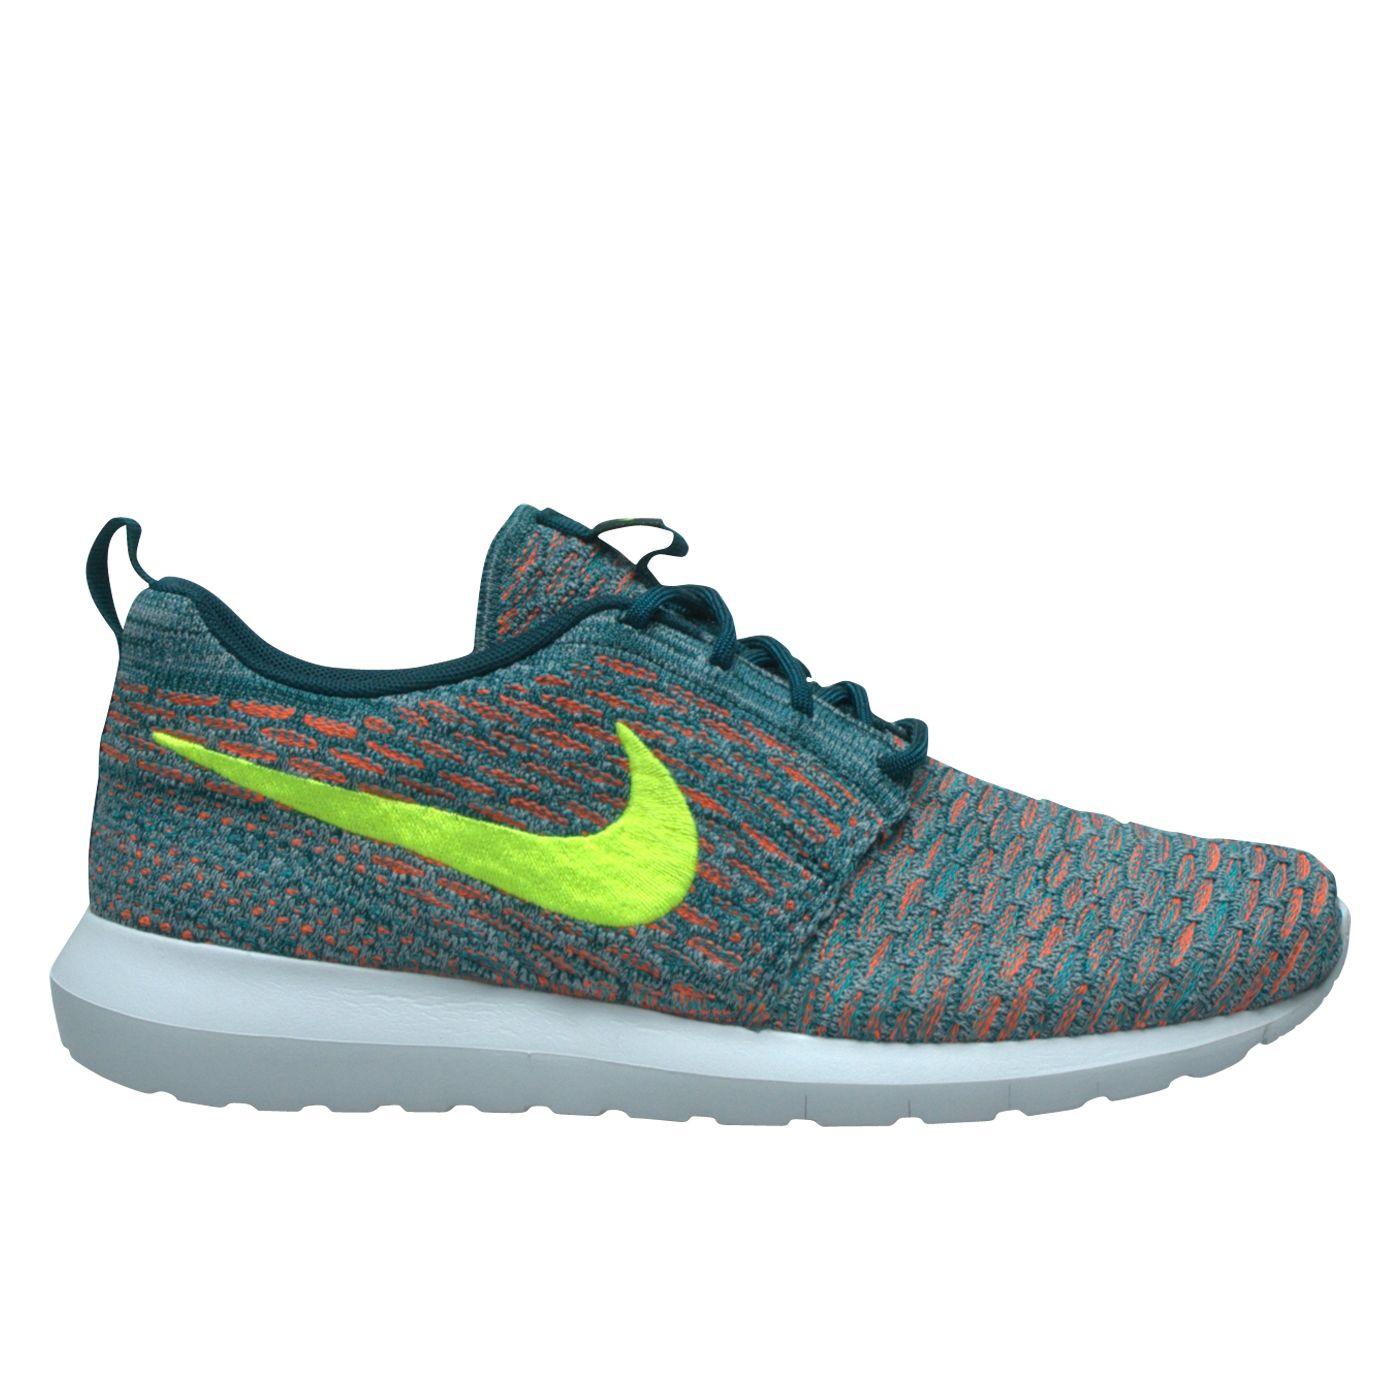 taille 40 0daaf 4ddfd Nike Flyknit Rosherun Light Blue/Orange - UEBERVART | Nike ...